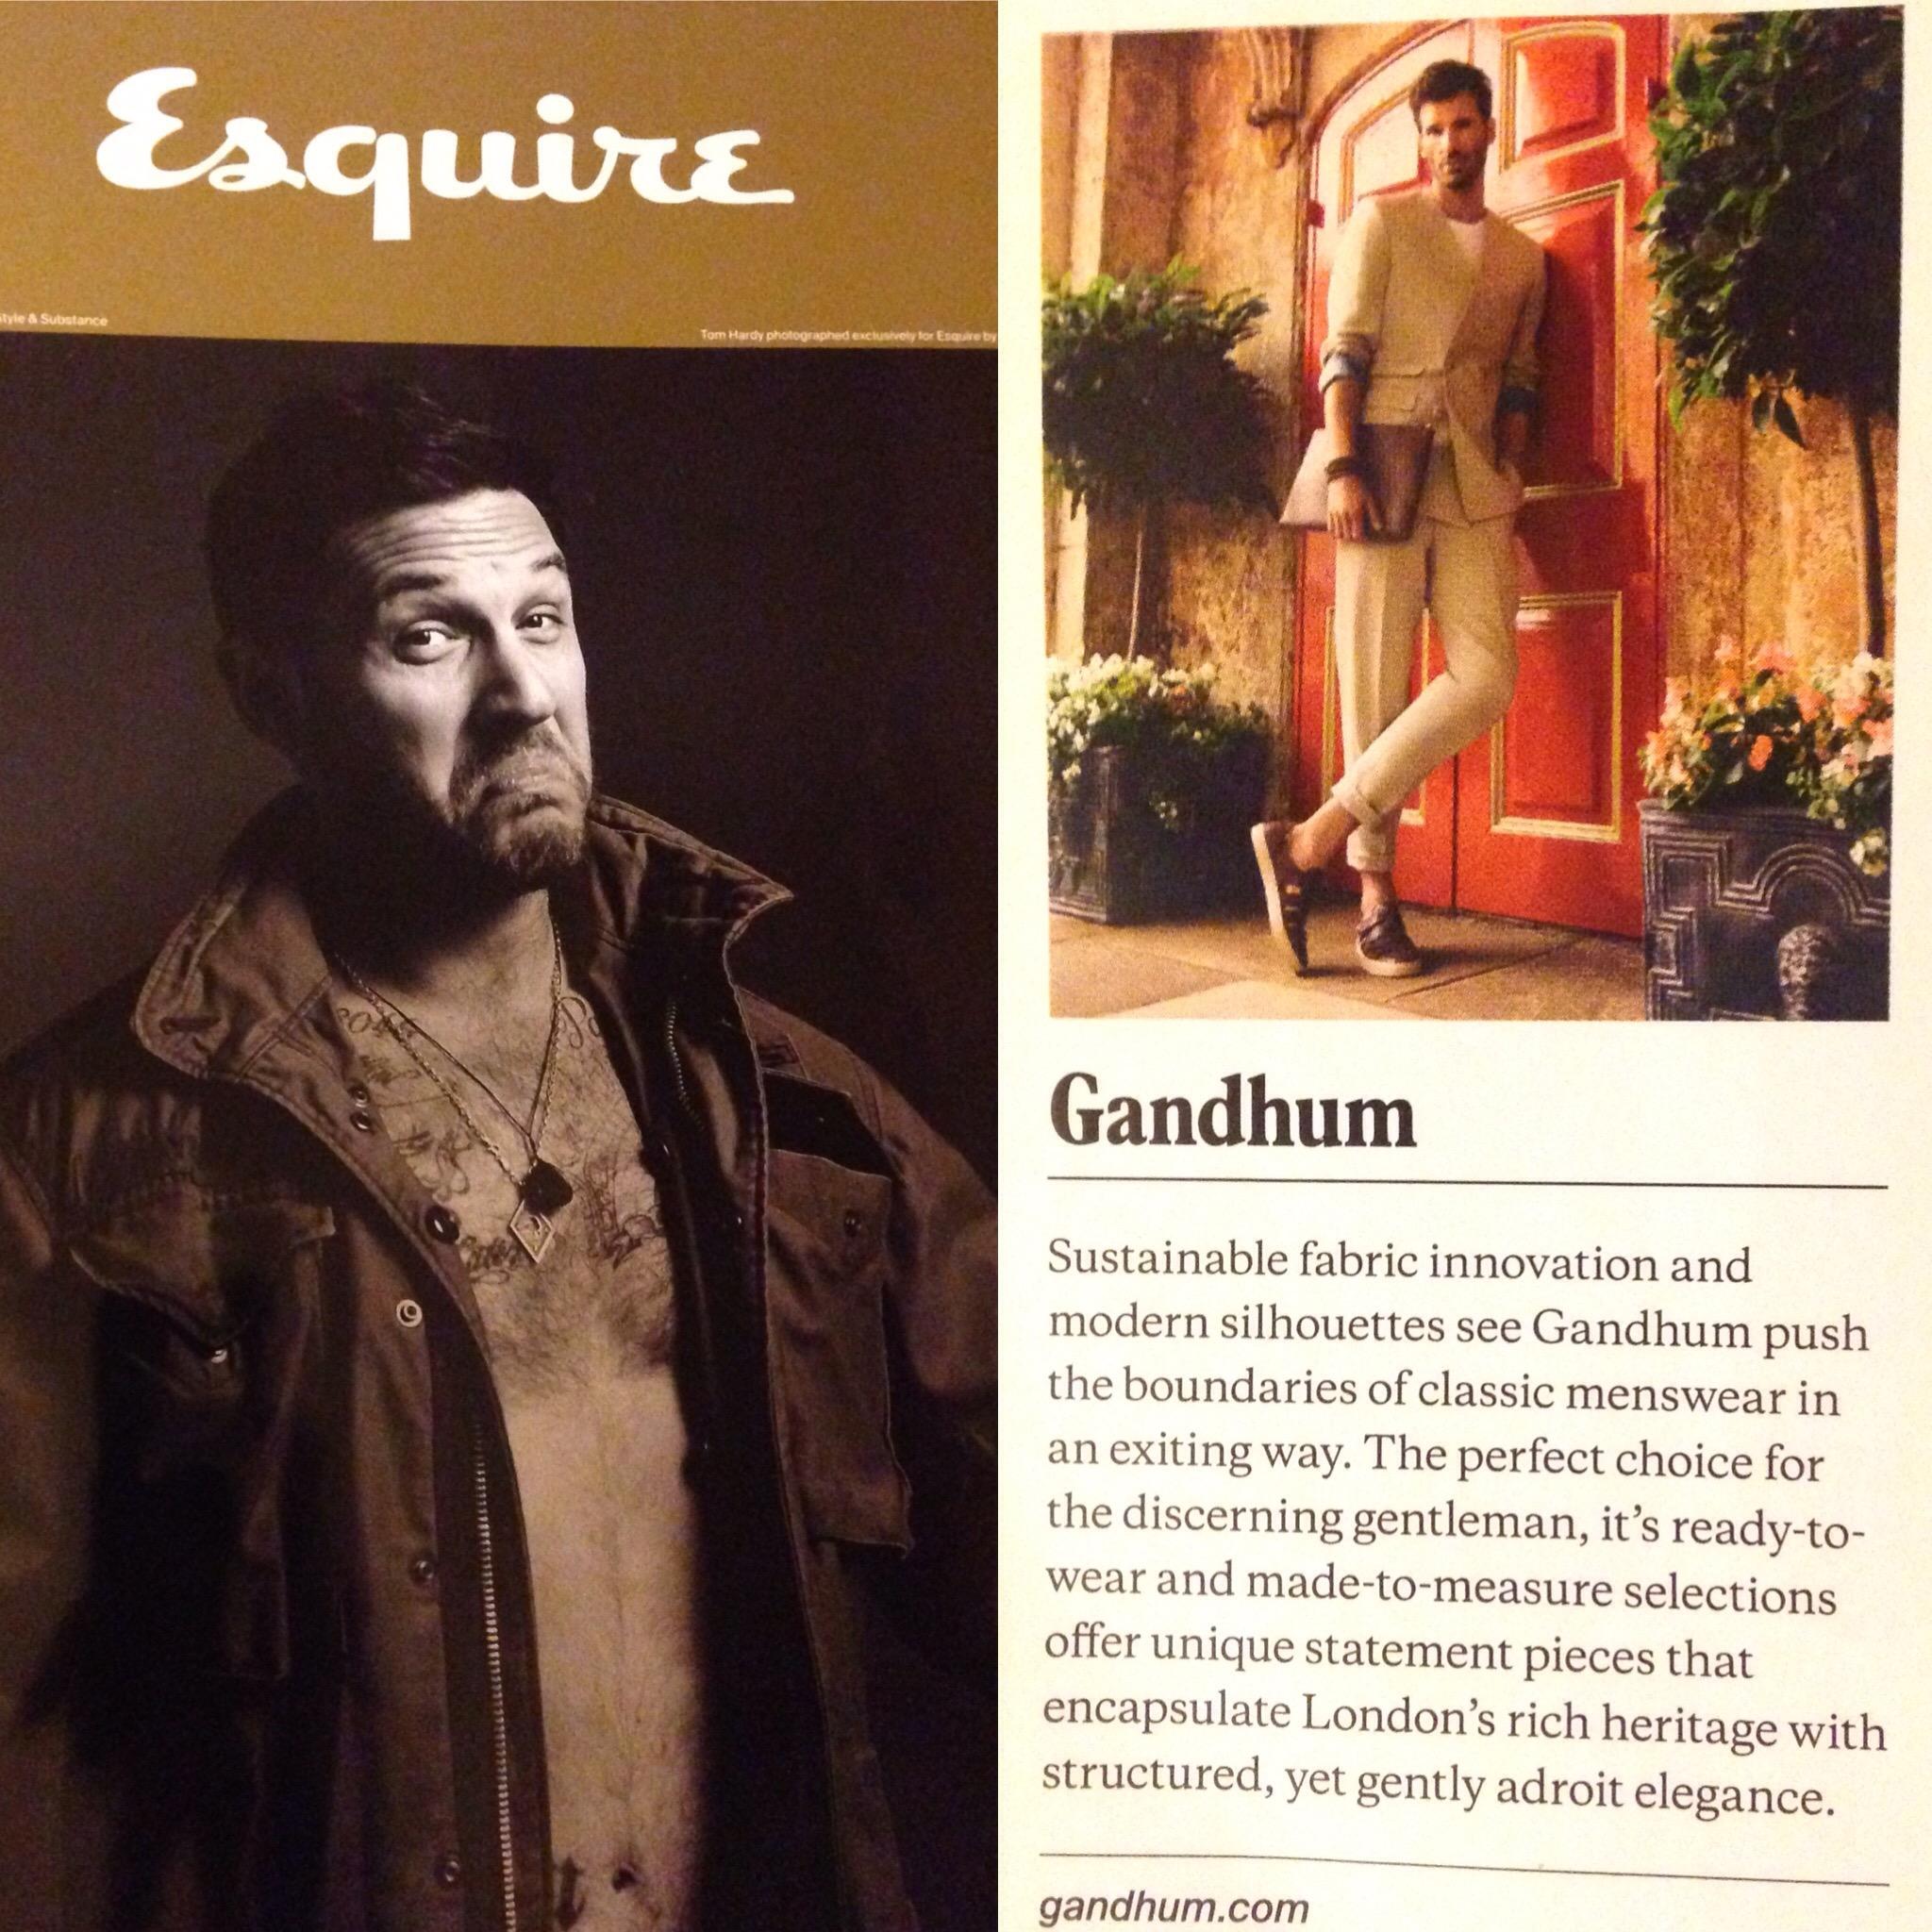 GANDHUM featured in the Esquire Jan/Feb 2017 issue